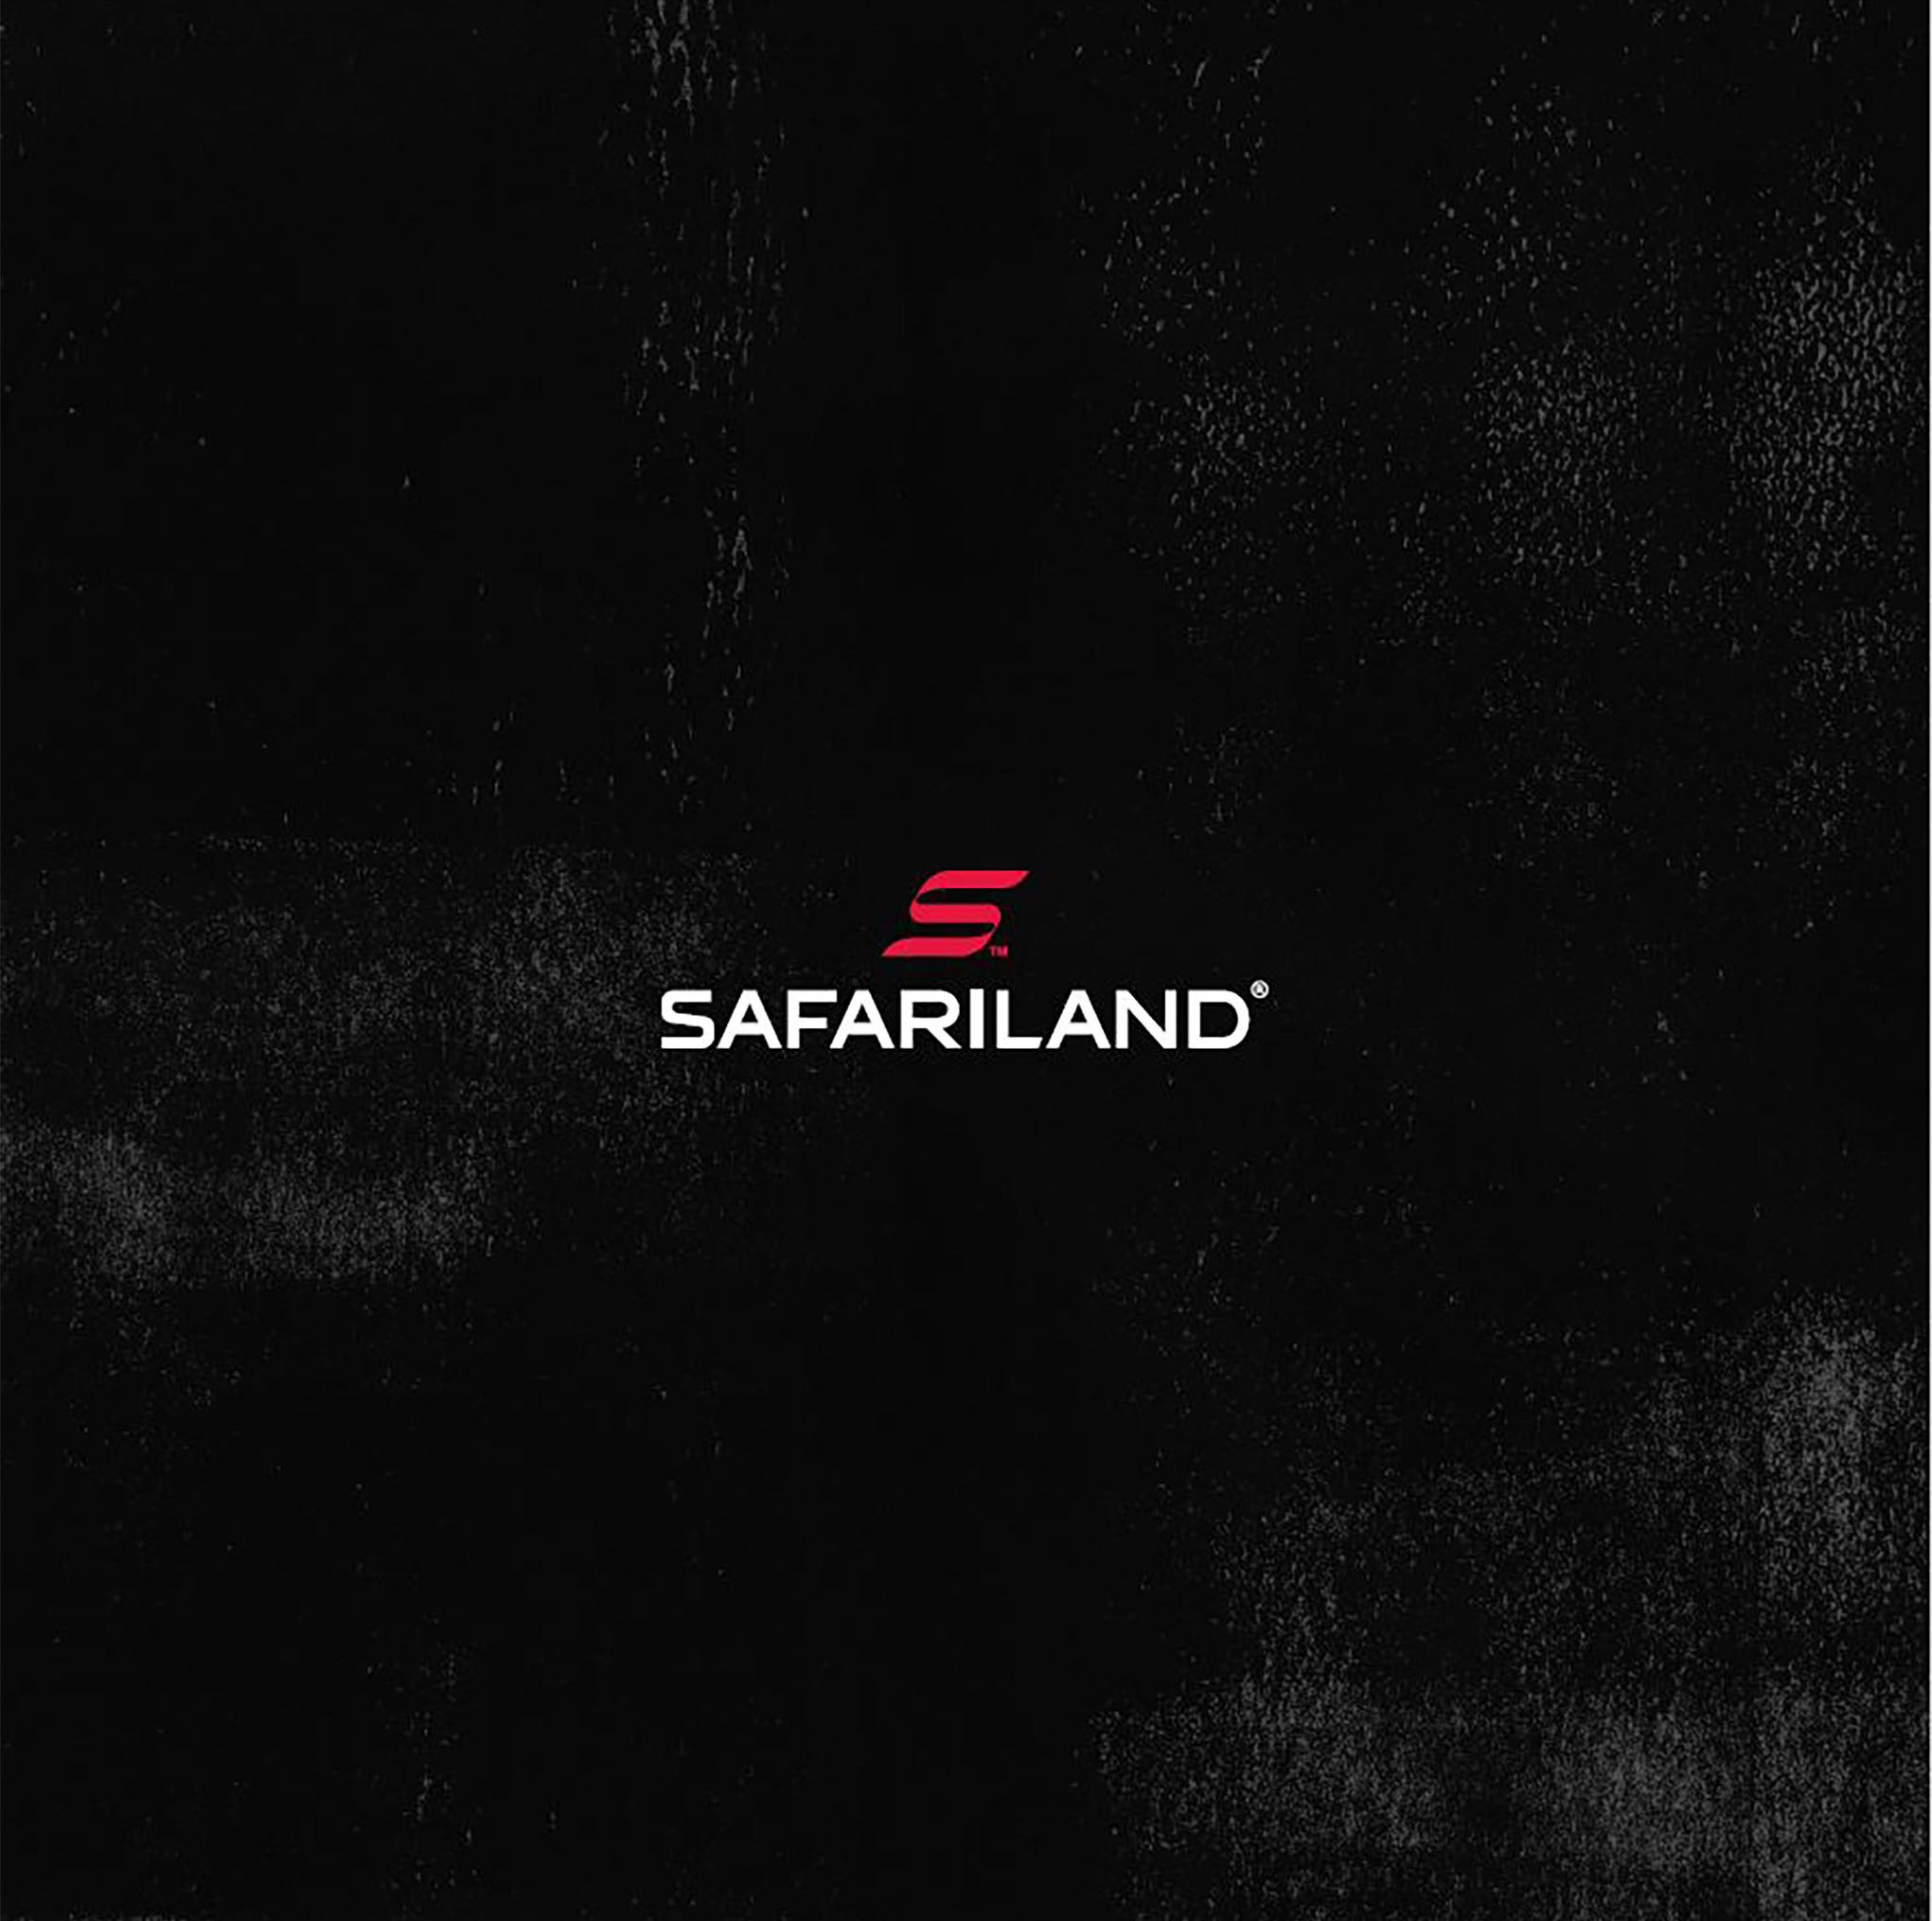 safariland order holster guide